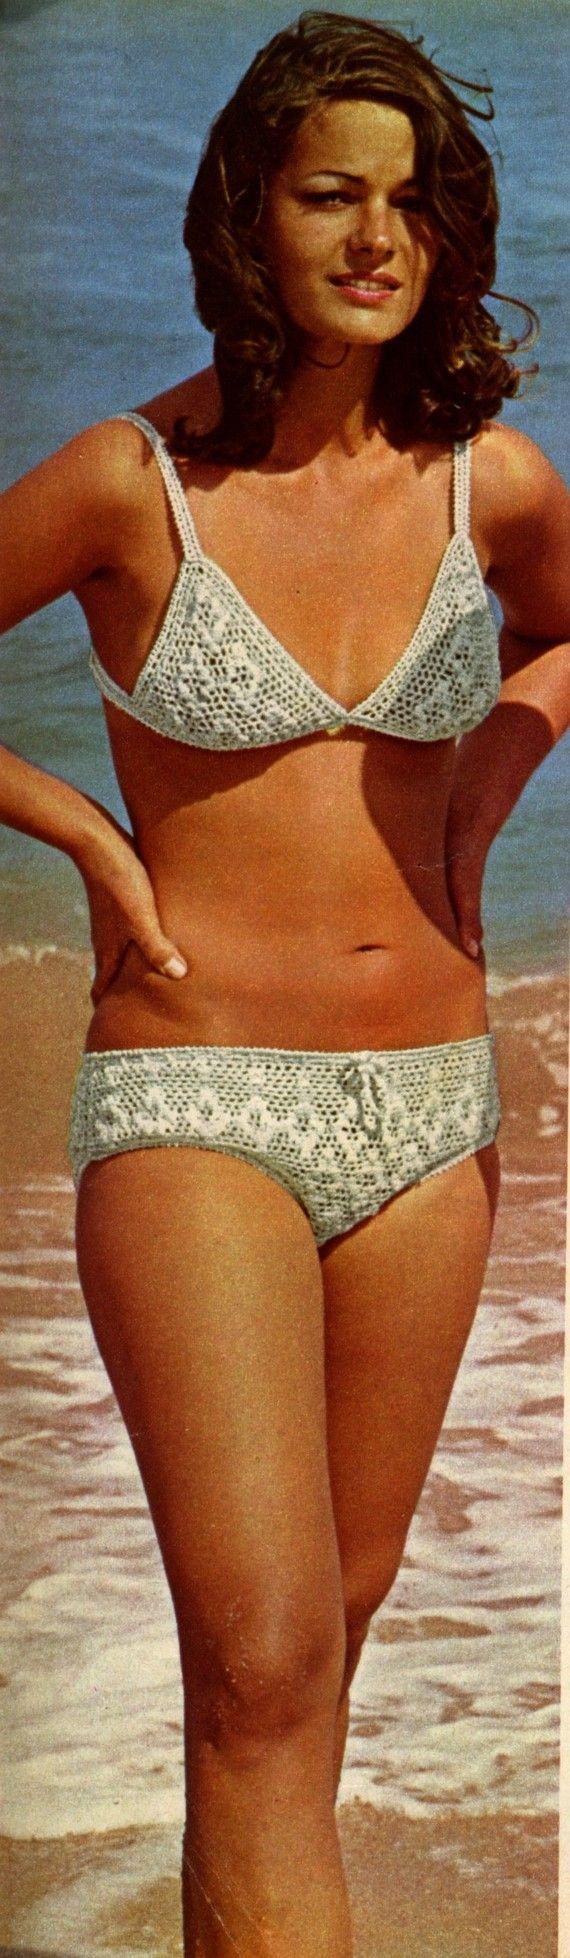 Vintage Crochet Pattern PDF 099 French White Bikini from WonkyZebra $2.00